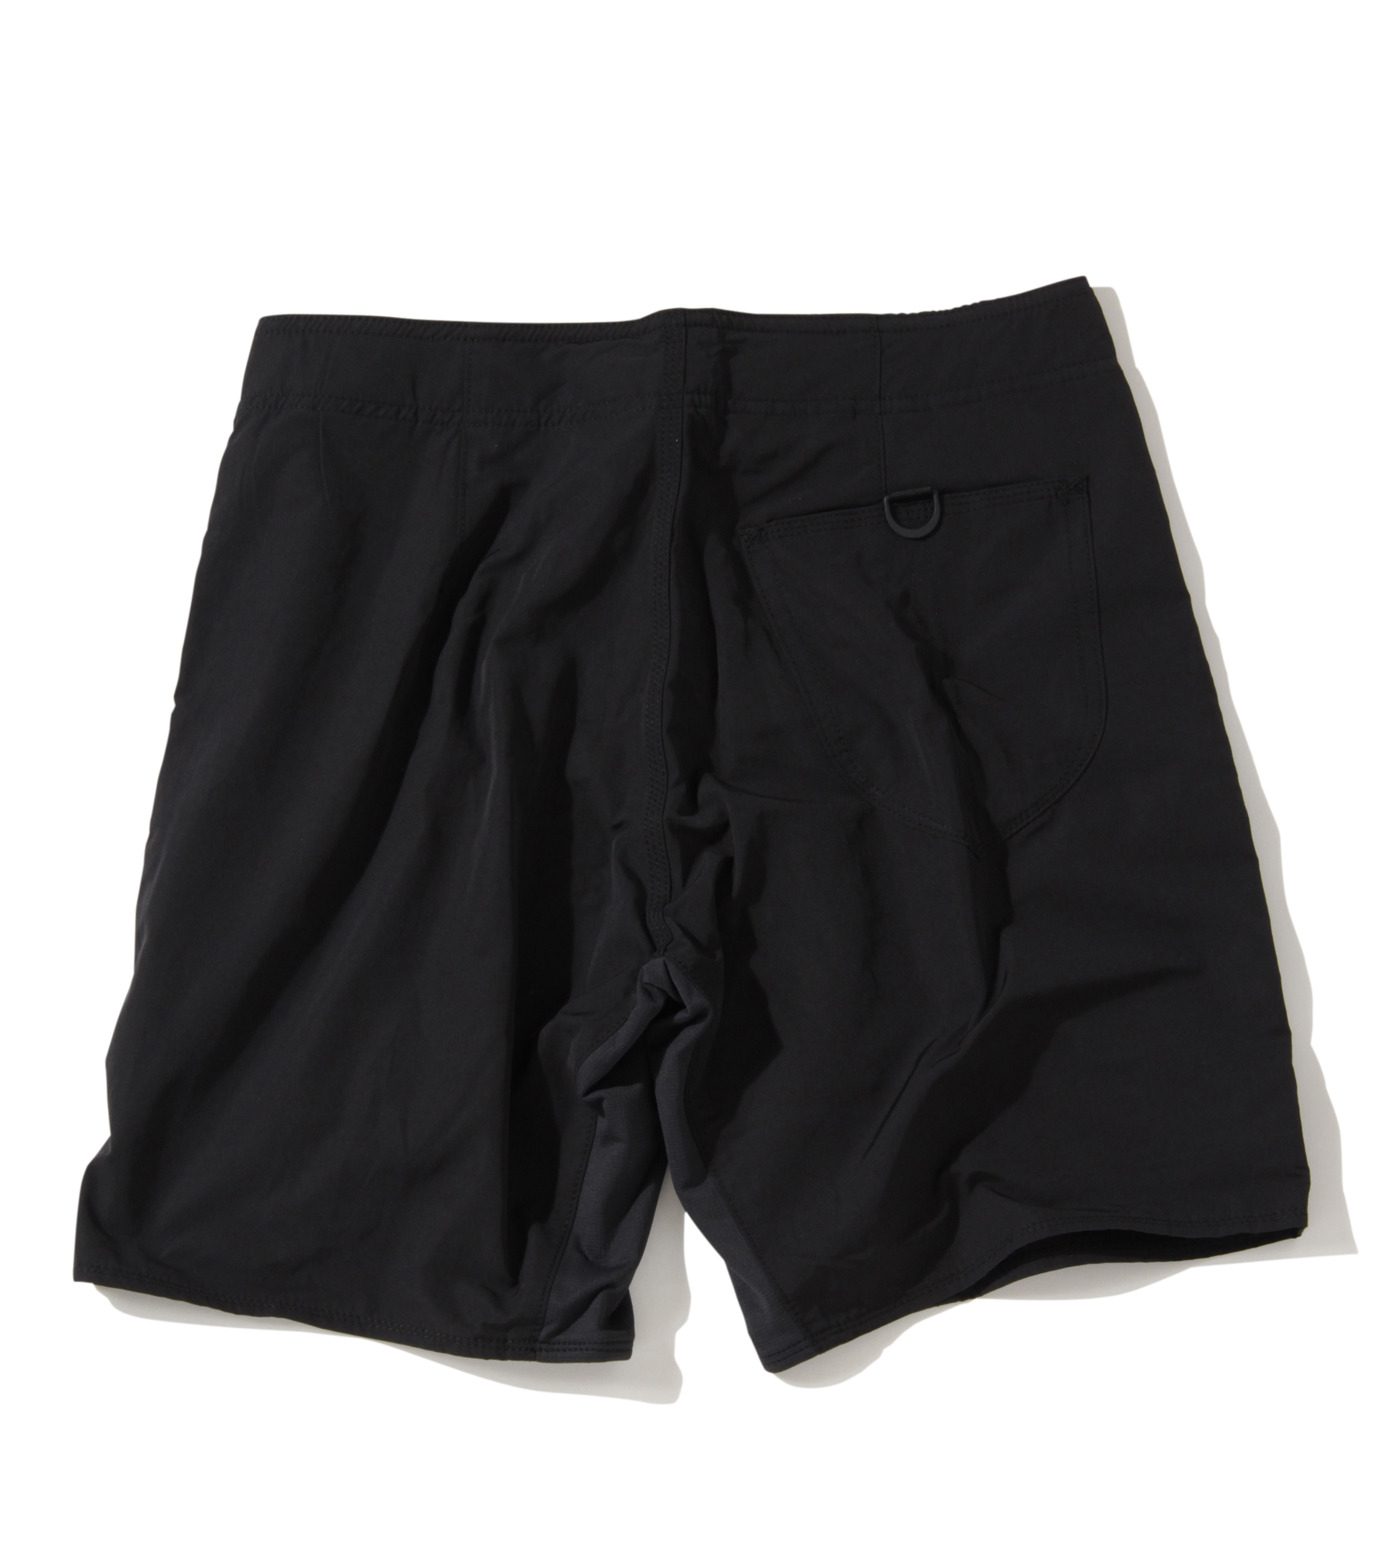 TWO TWO ONE(トゥートゥーワン)のSurf shorts short-BLACK(SWIMWEAR/SWIMWEAR)-15N948001-13 拡大詳細画像2